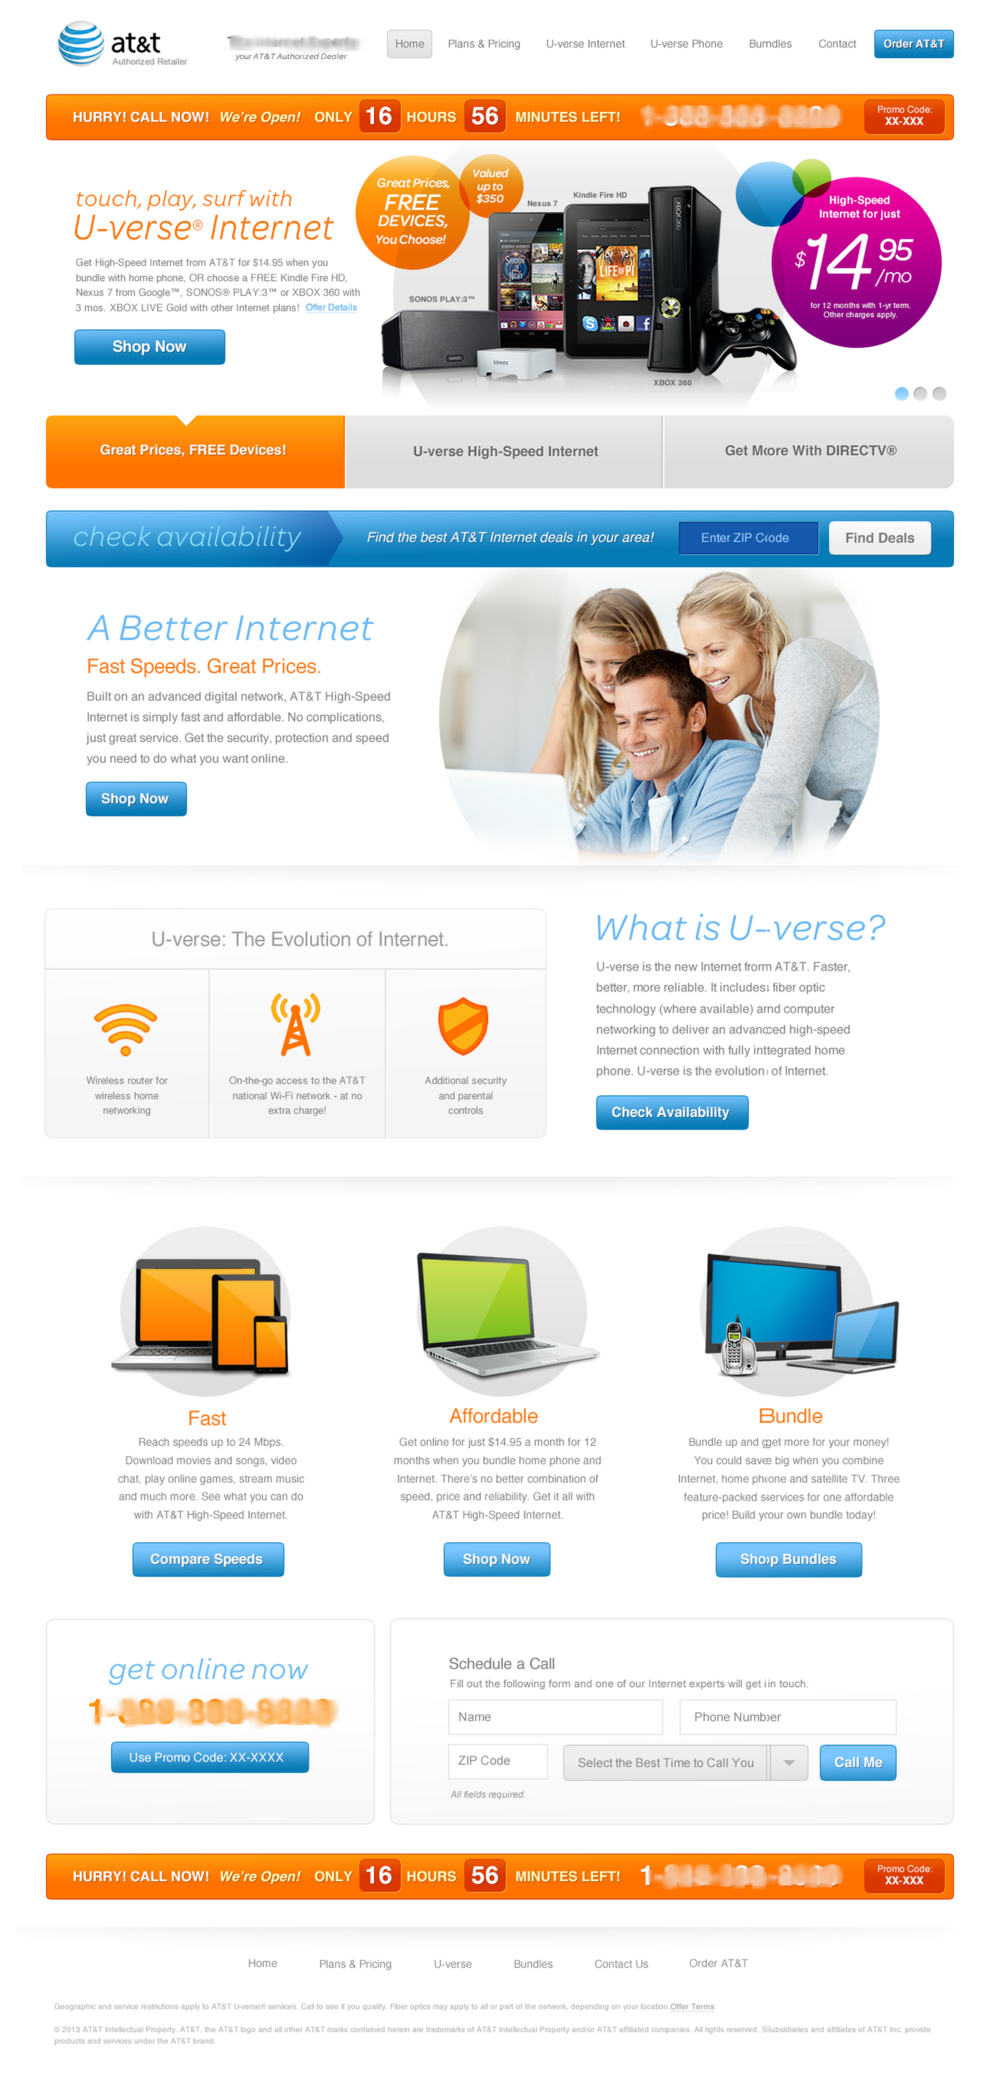 U-verse Internet